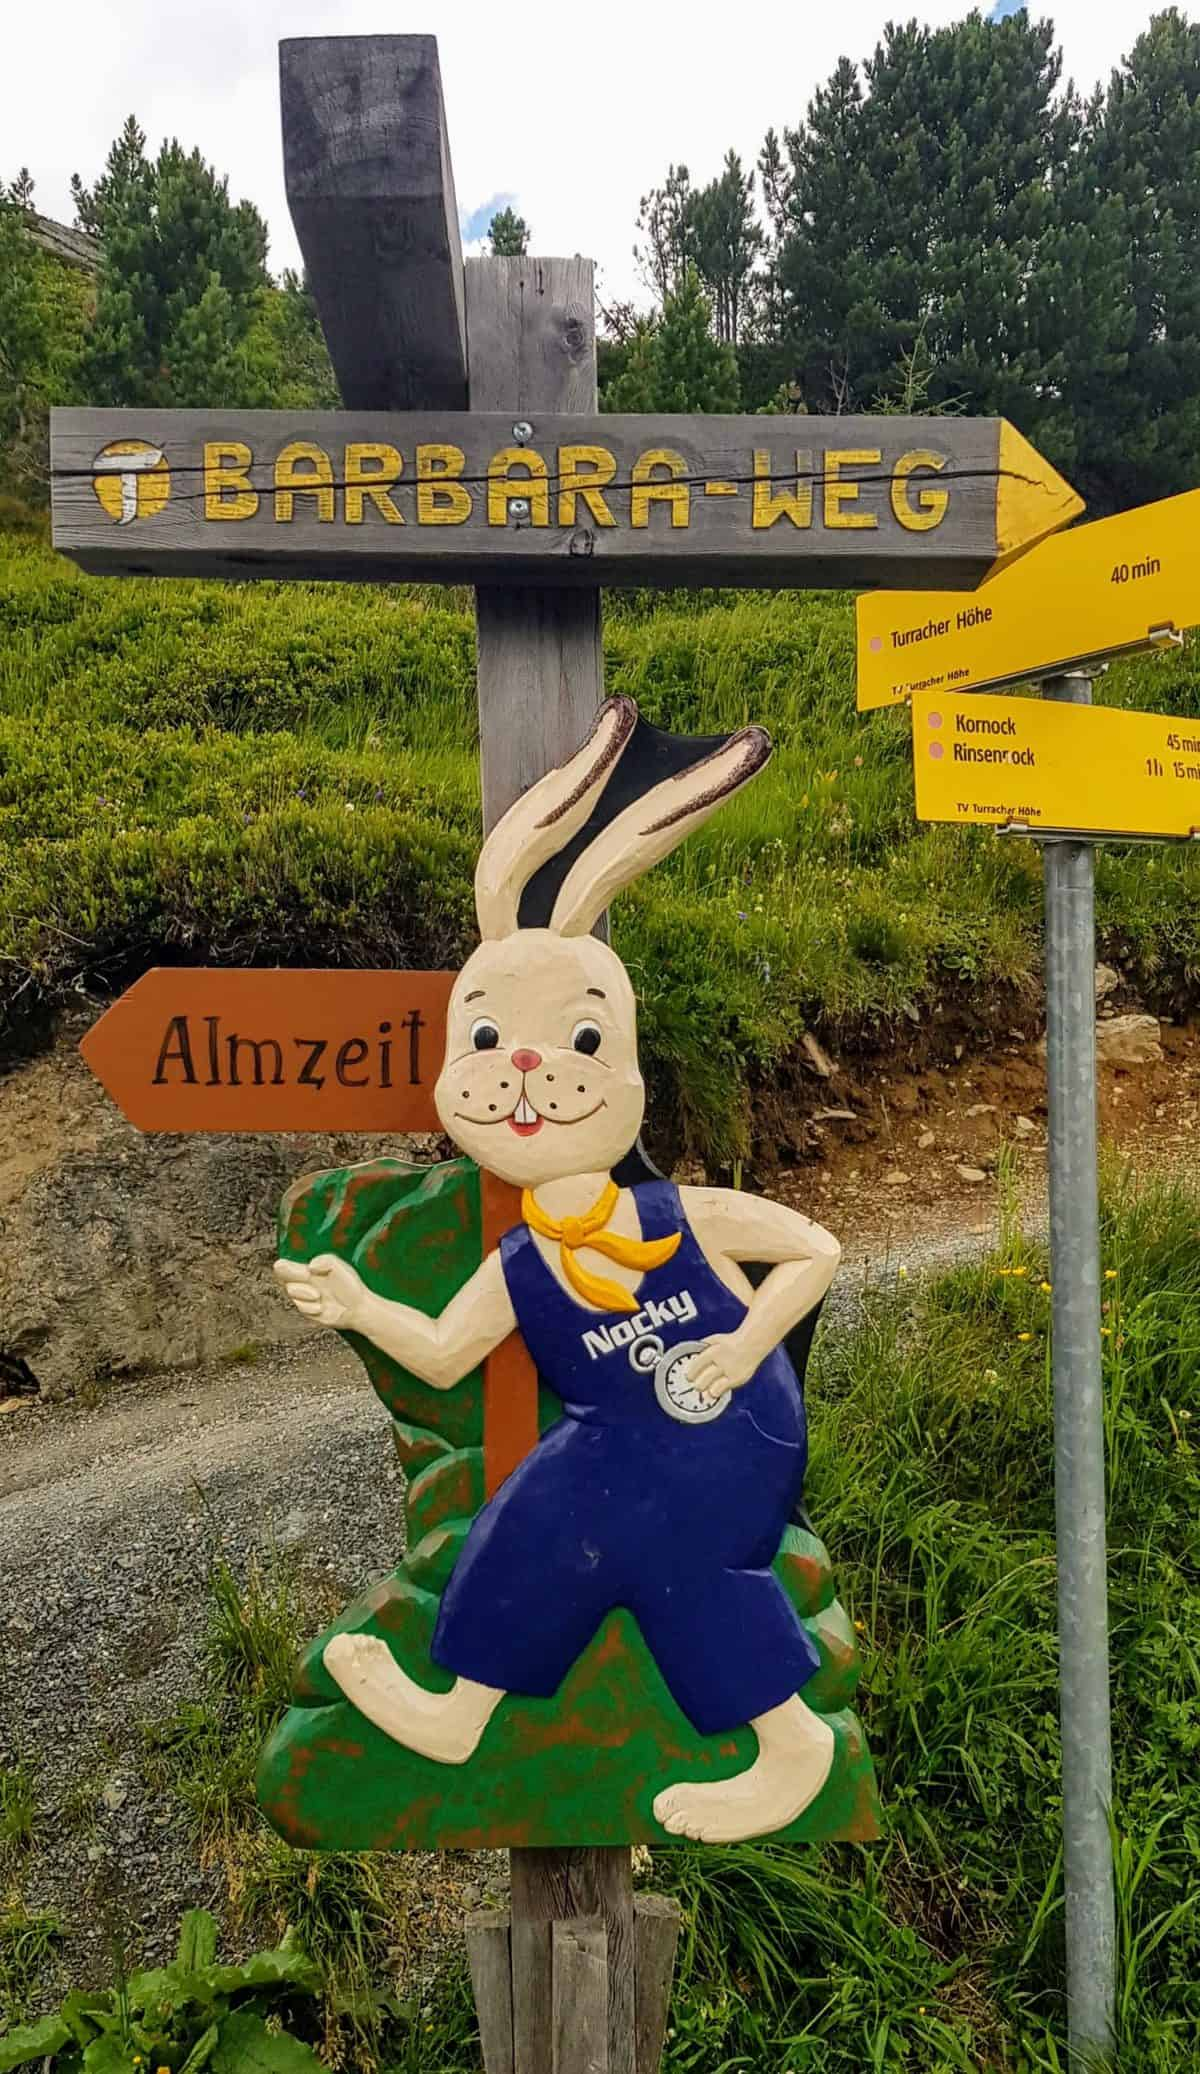 Wandern Familie Turracher Höhe Barbaraweg